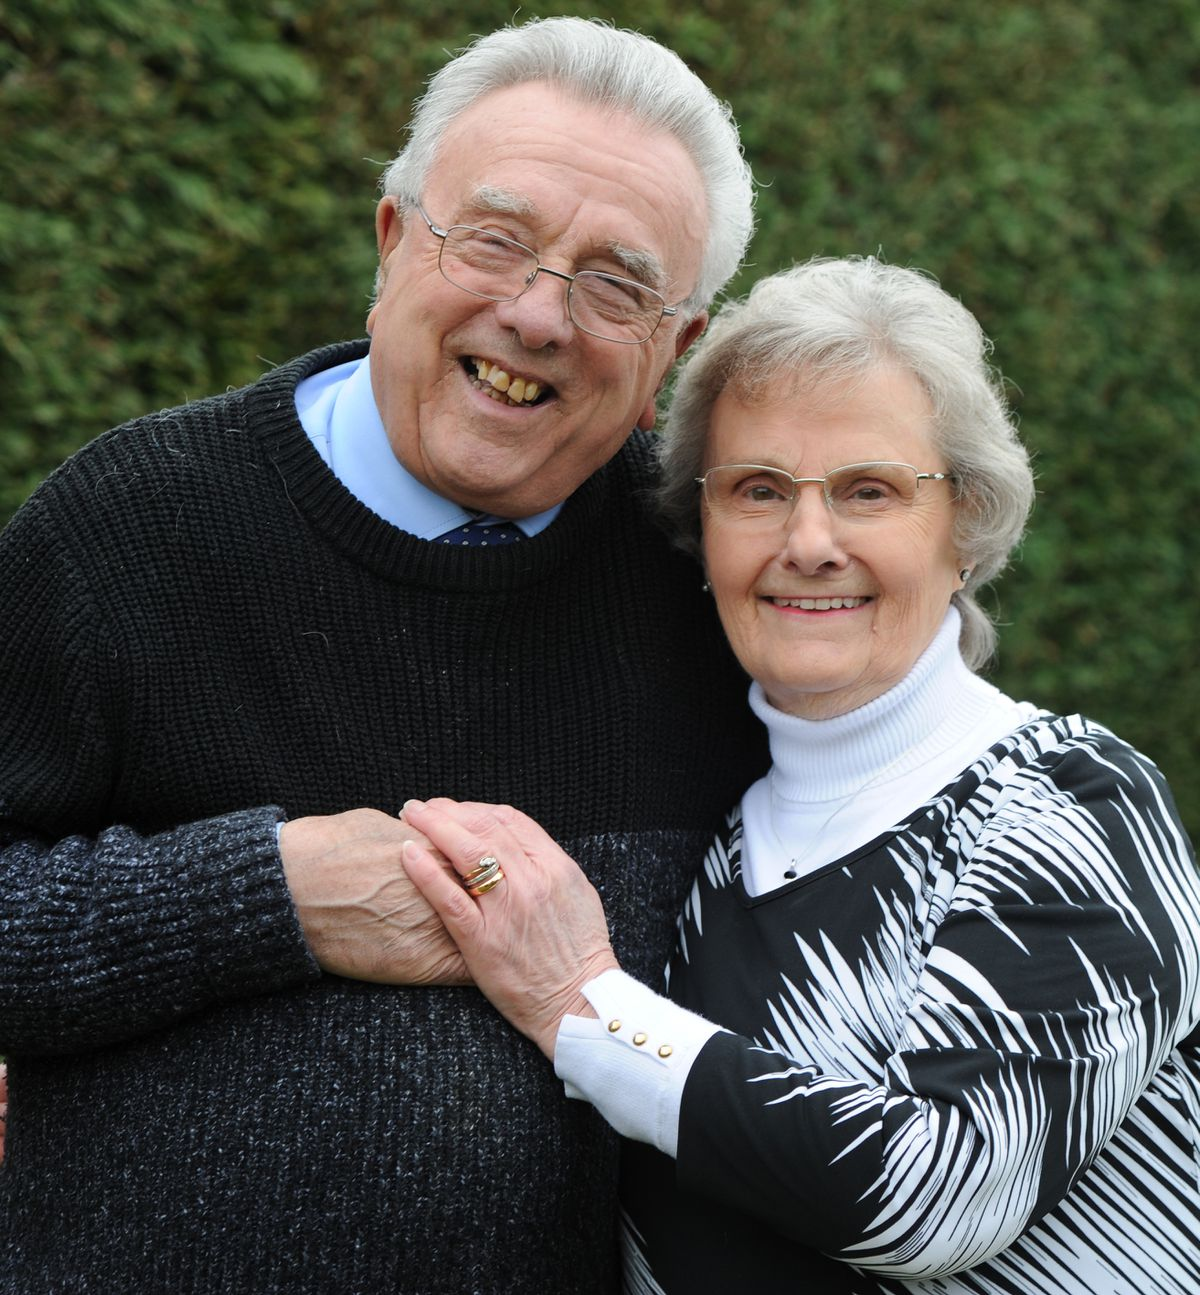 Celebrating their diamond wedding anniversary Don Price and his wife Sheila Price, of Bilbrook, Wolverhampton